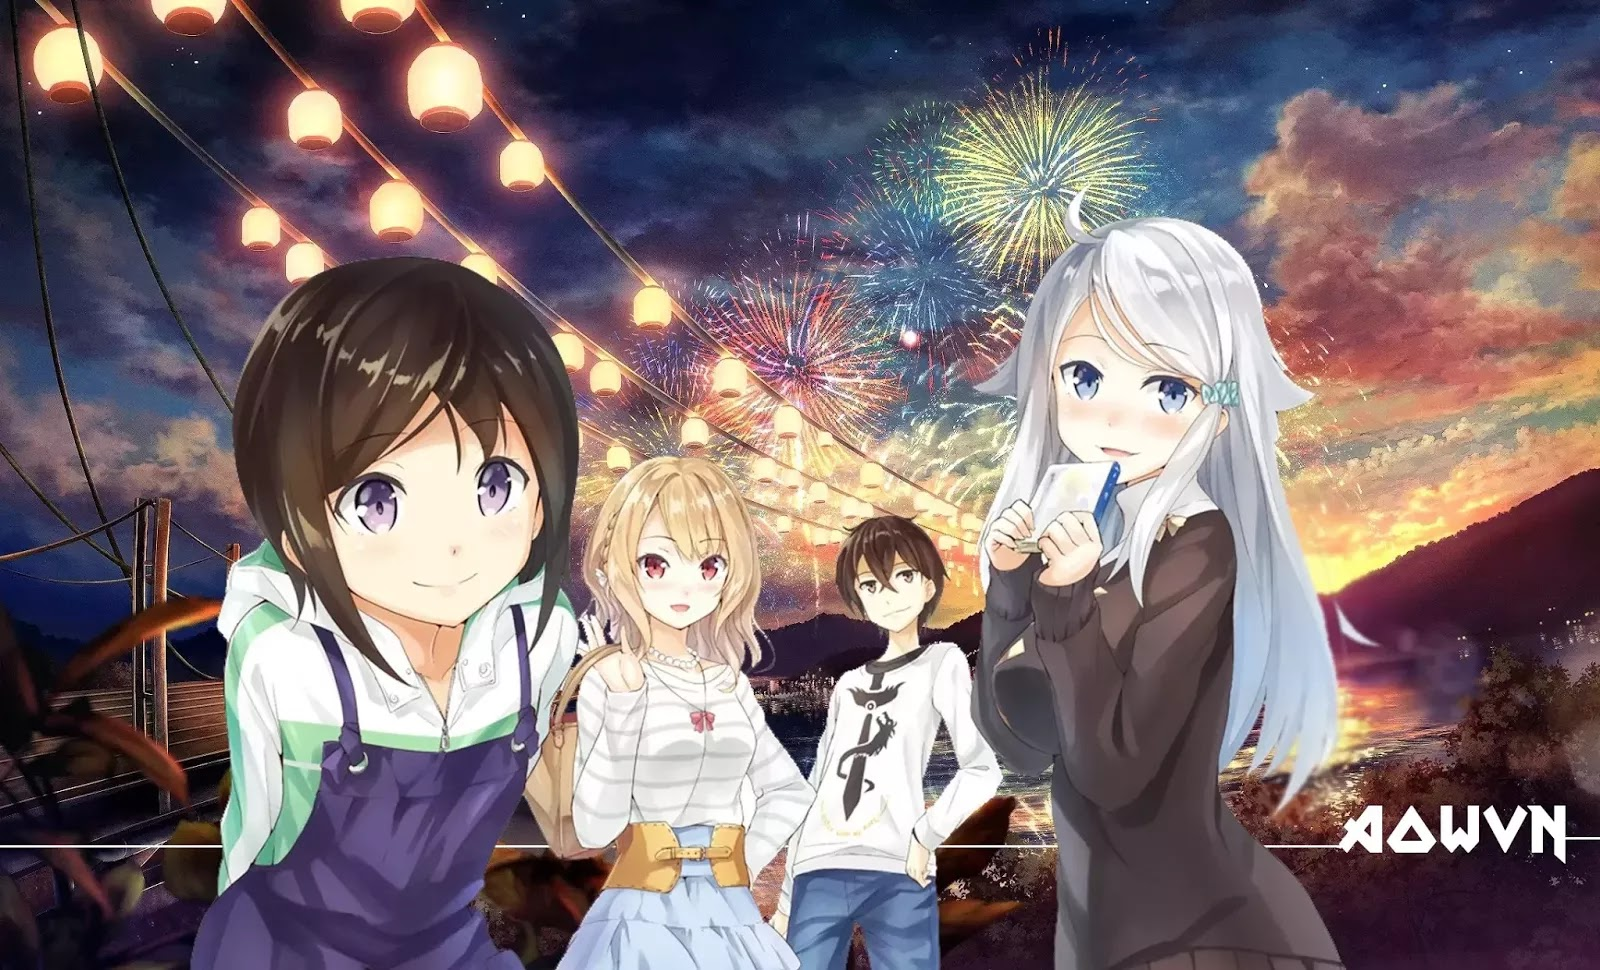 AowVN m%2B%25281%2529 - [ Anime 3gp Mp4 ] Imouto sae Ireba Ii | Vietsub - Hài Hước